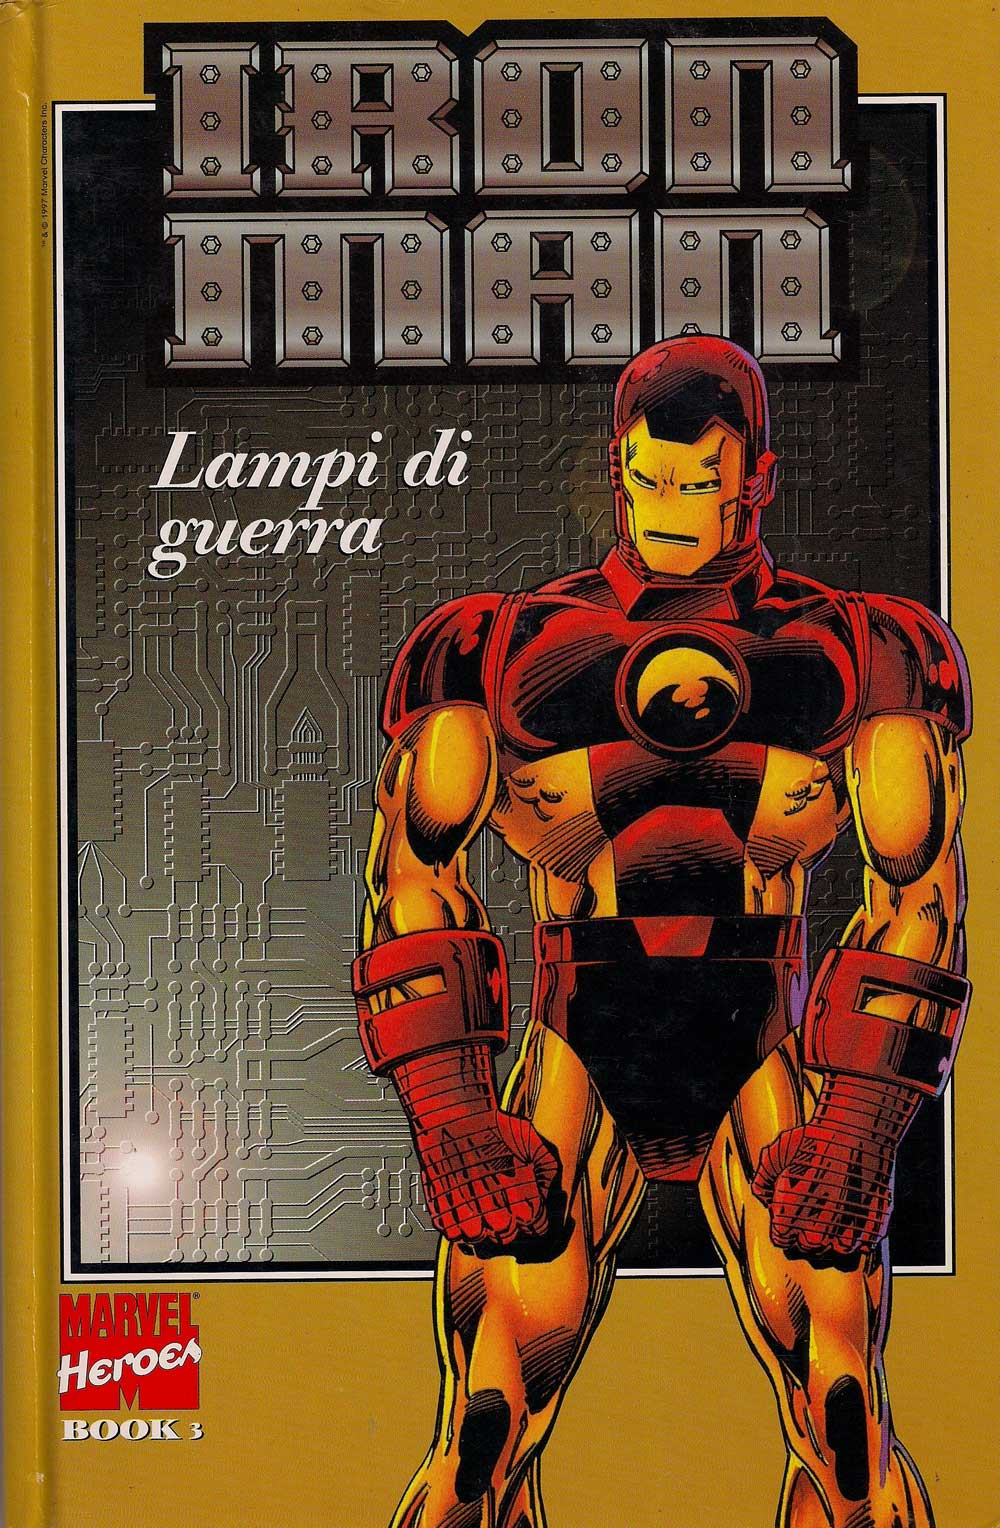 300-iron-man-lampi-di-guerra-cover